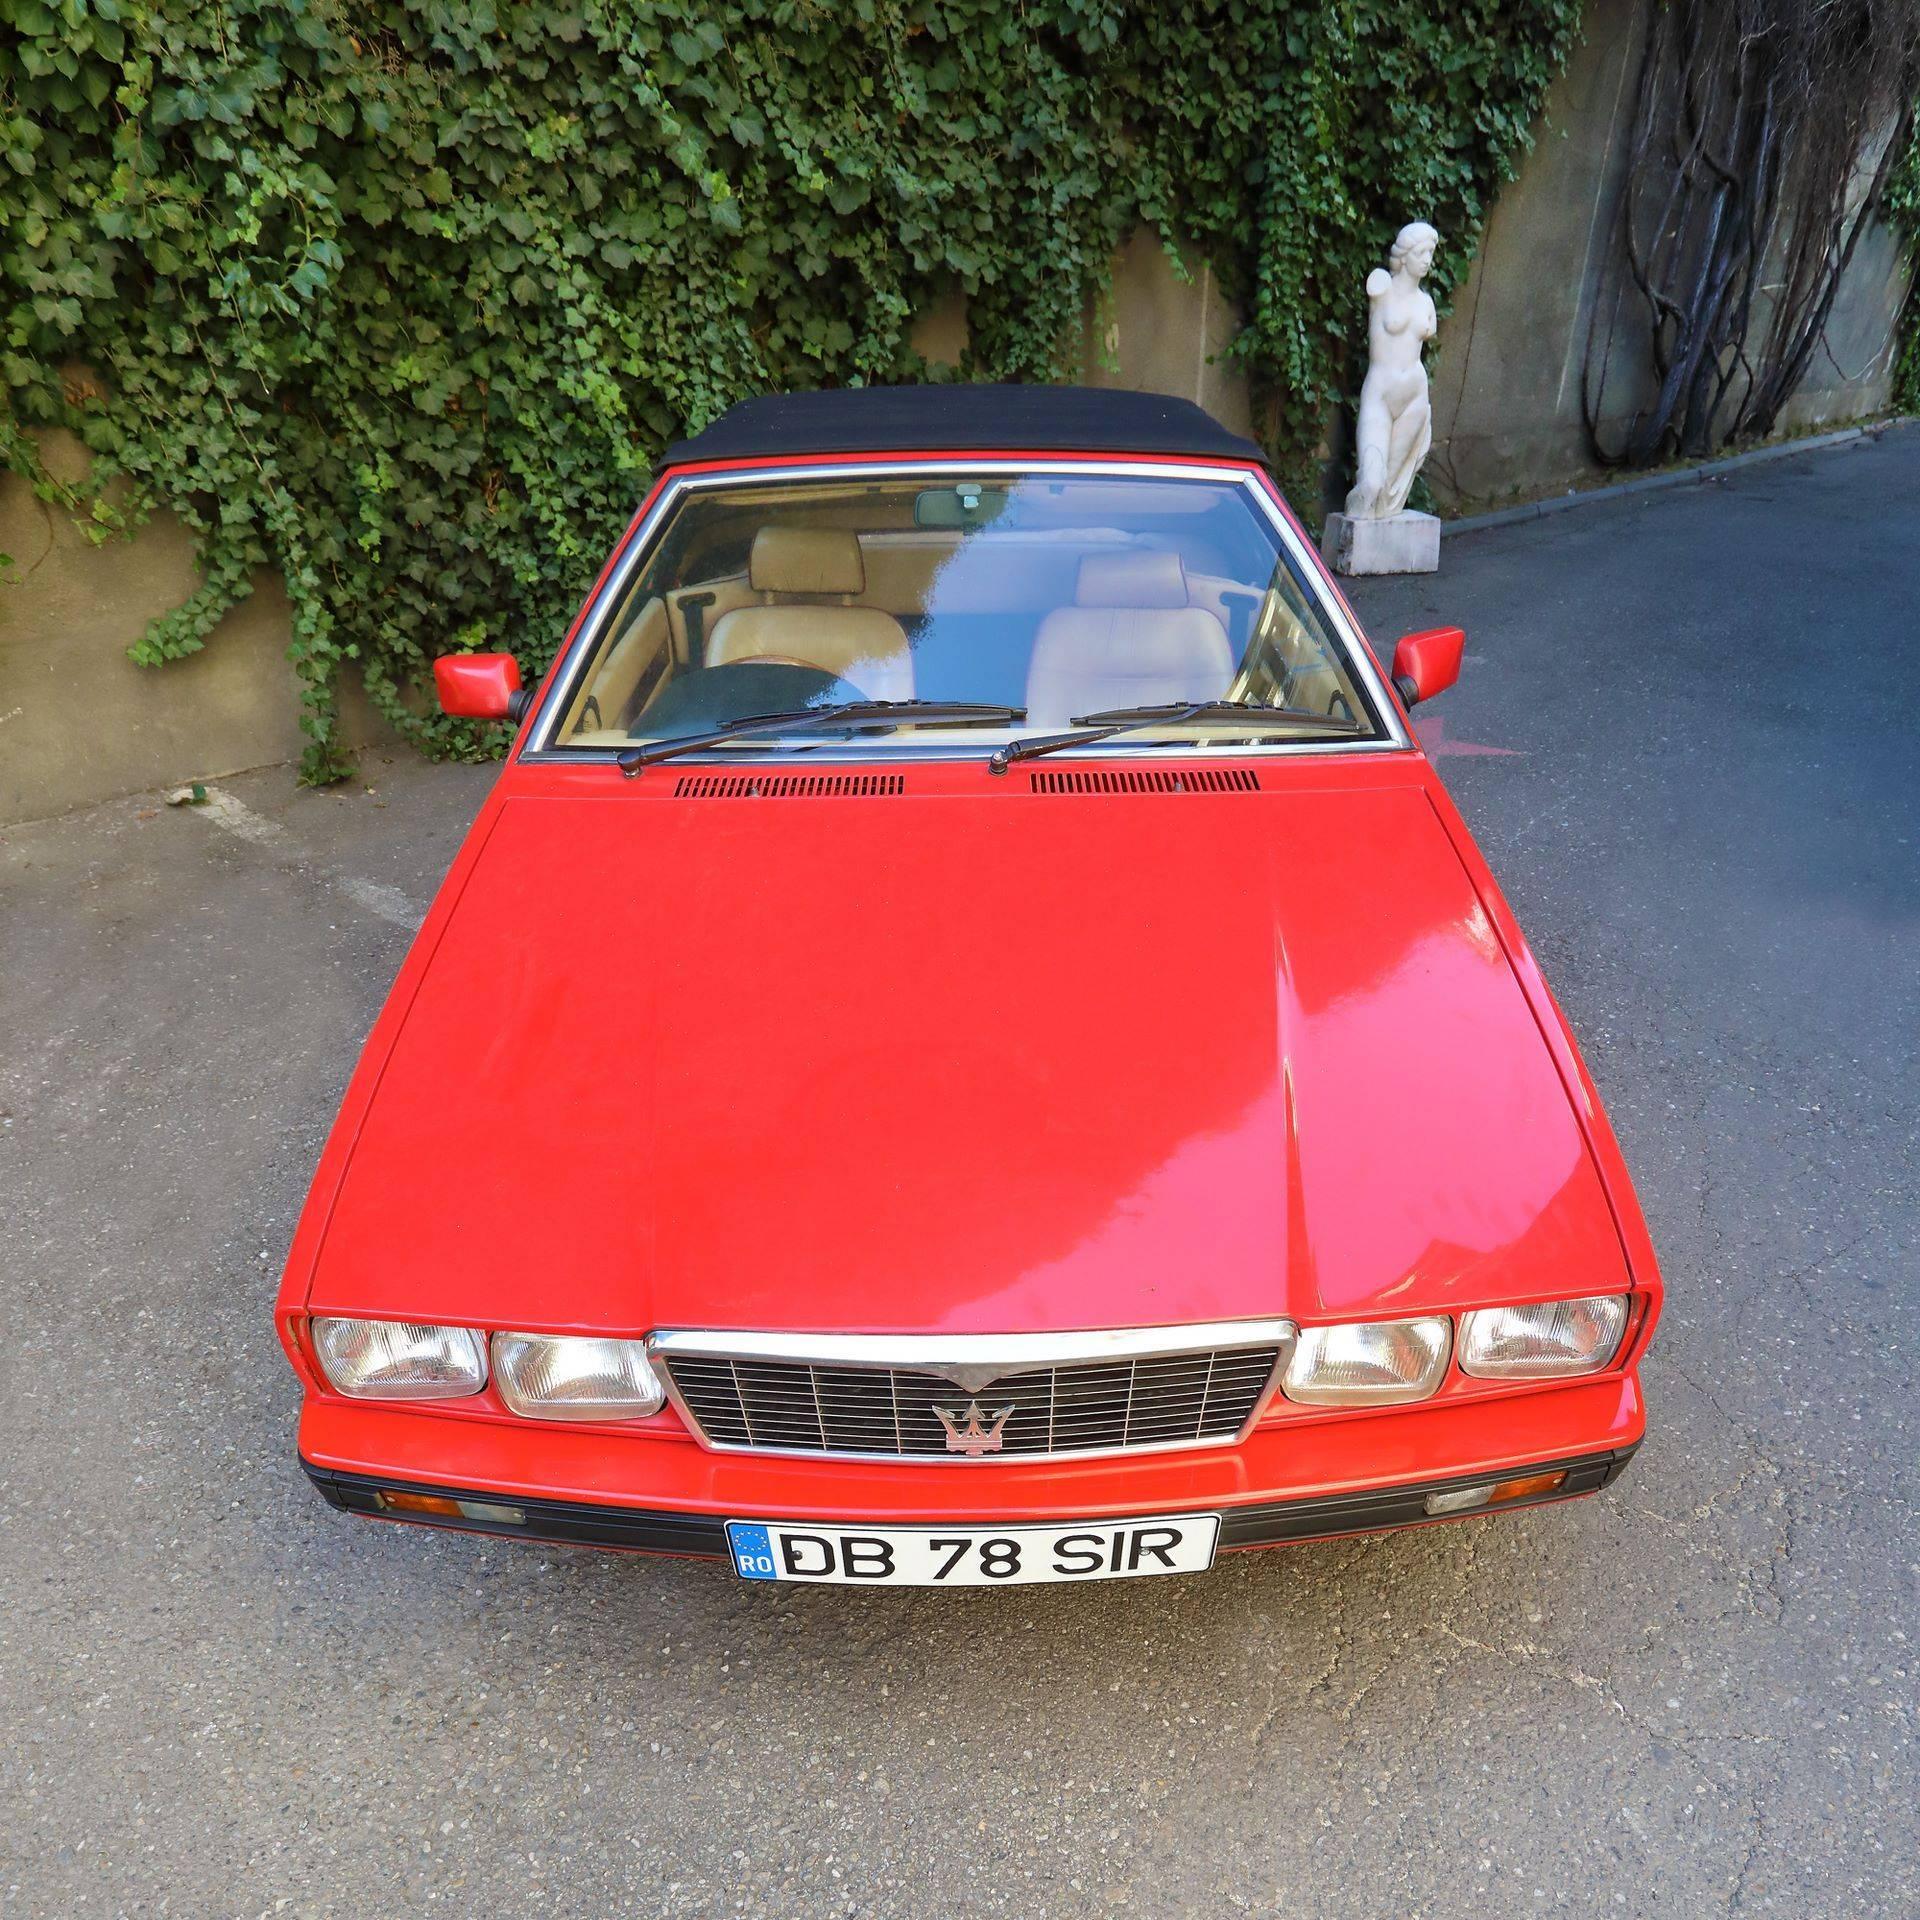 Maserati-Biturbo-Spyder-Elton-John-4